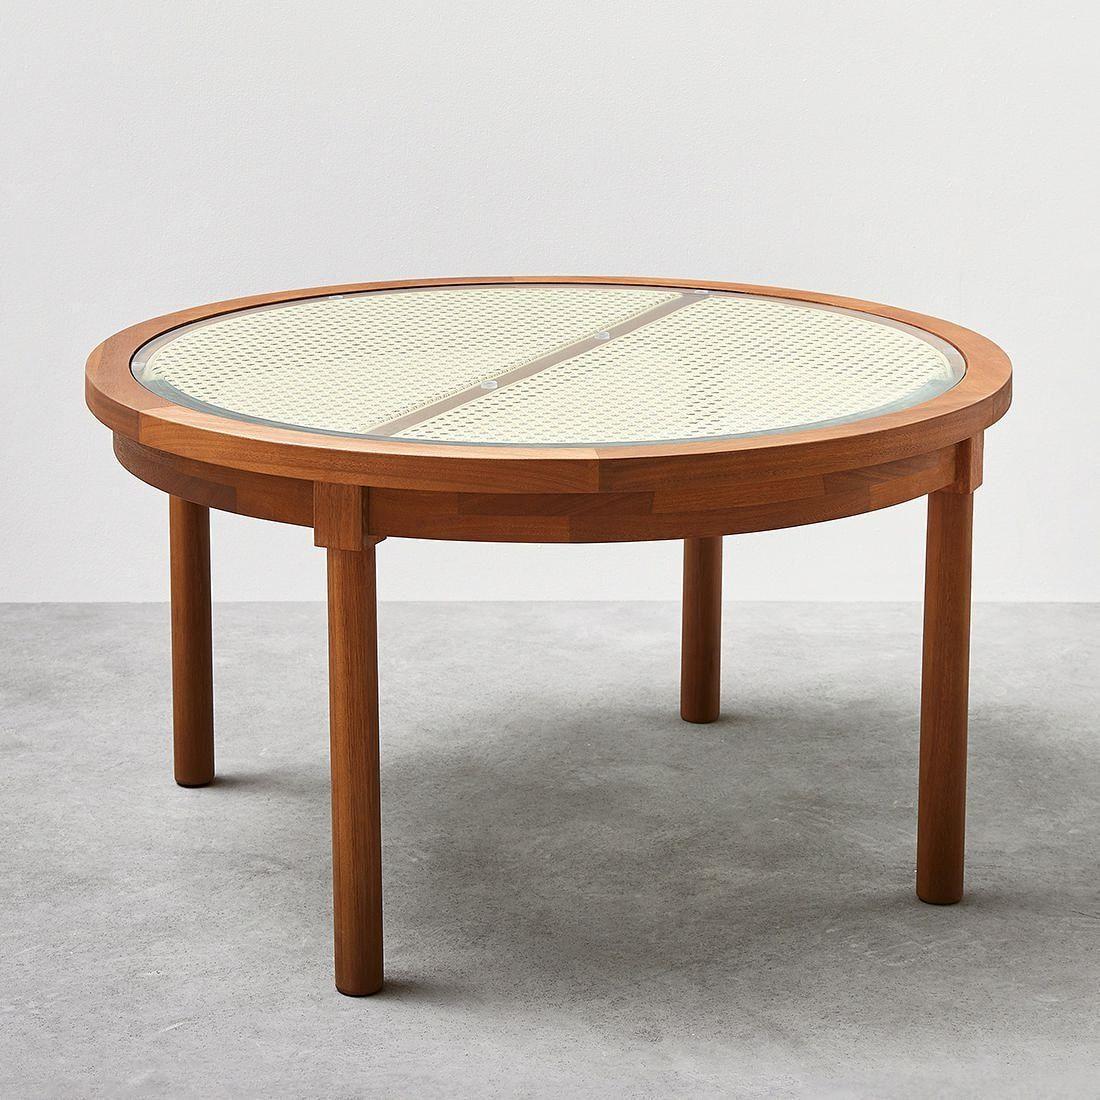 Cohen Coffee Table Target Australia Coffee Table Coffee Table Wood Target Coffee Table [ 1100 x 1100 Pixel ]